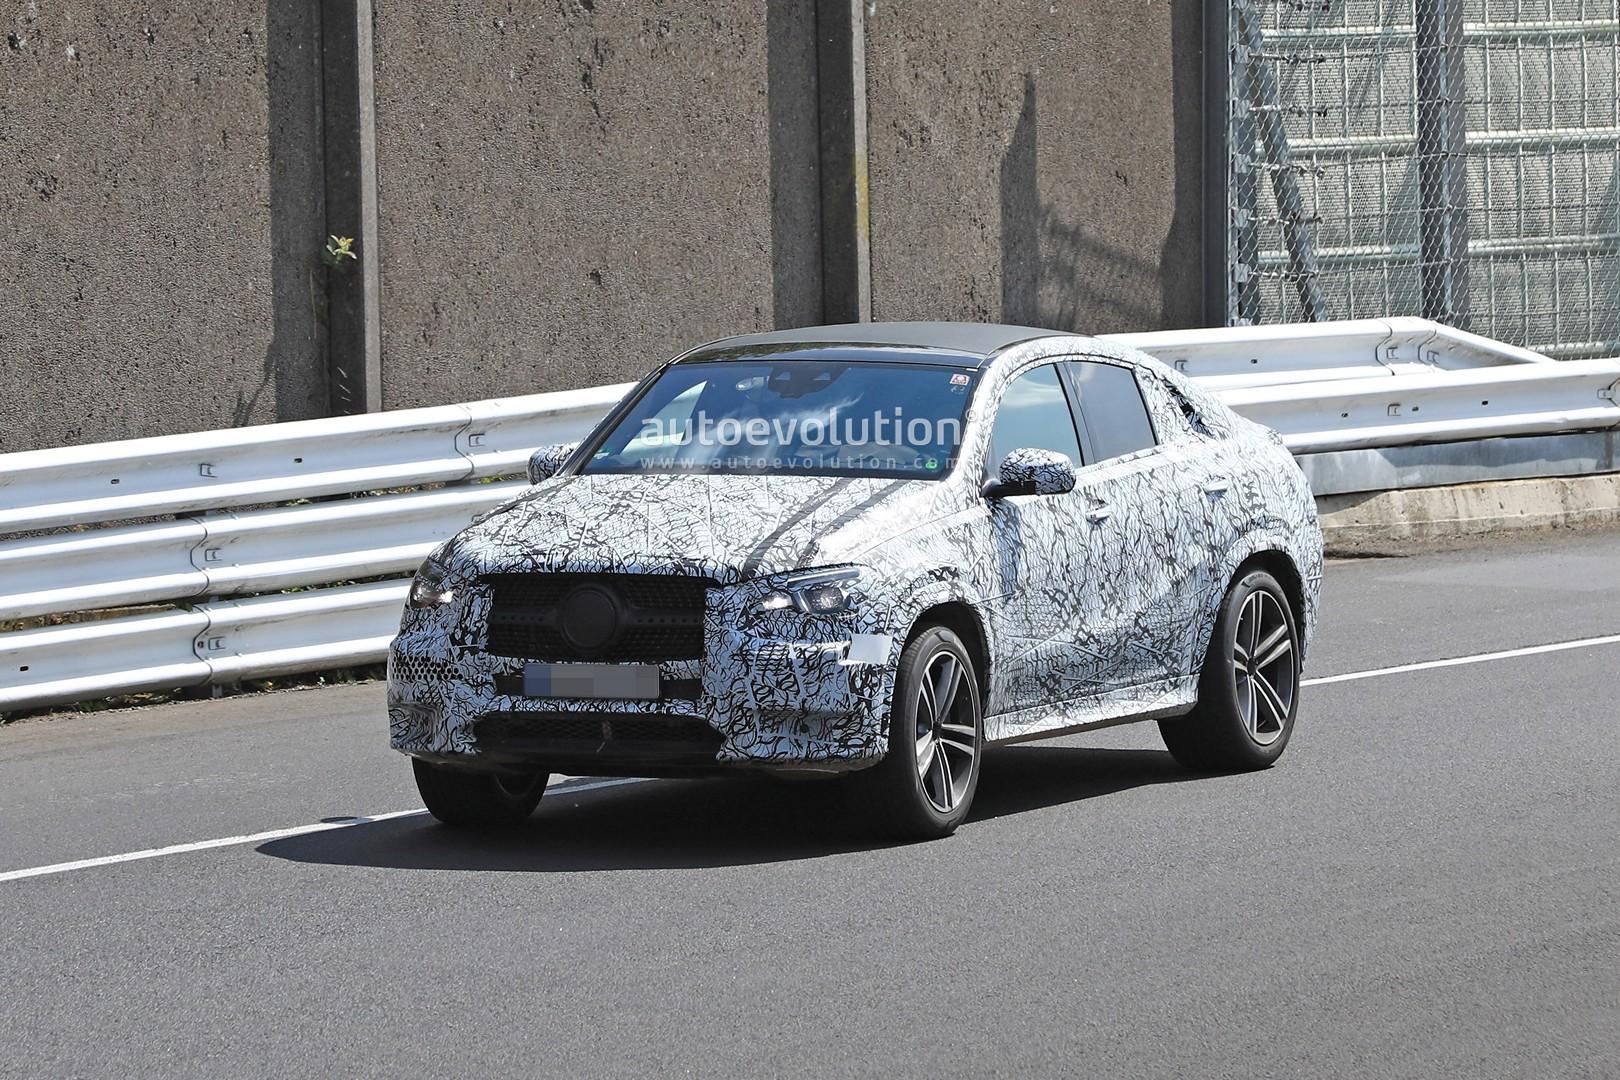 2020 mercedes gle coupe makes nurburgring spyshots debut autoevolution. Black Bedroom Furniture Sets. Home Design Ideas